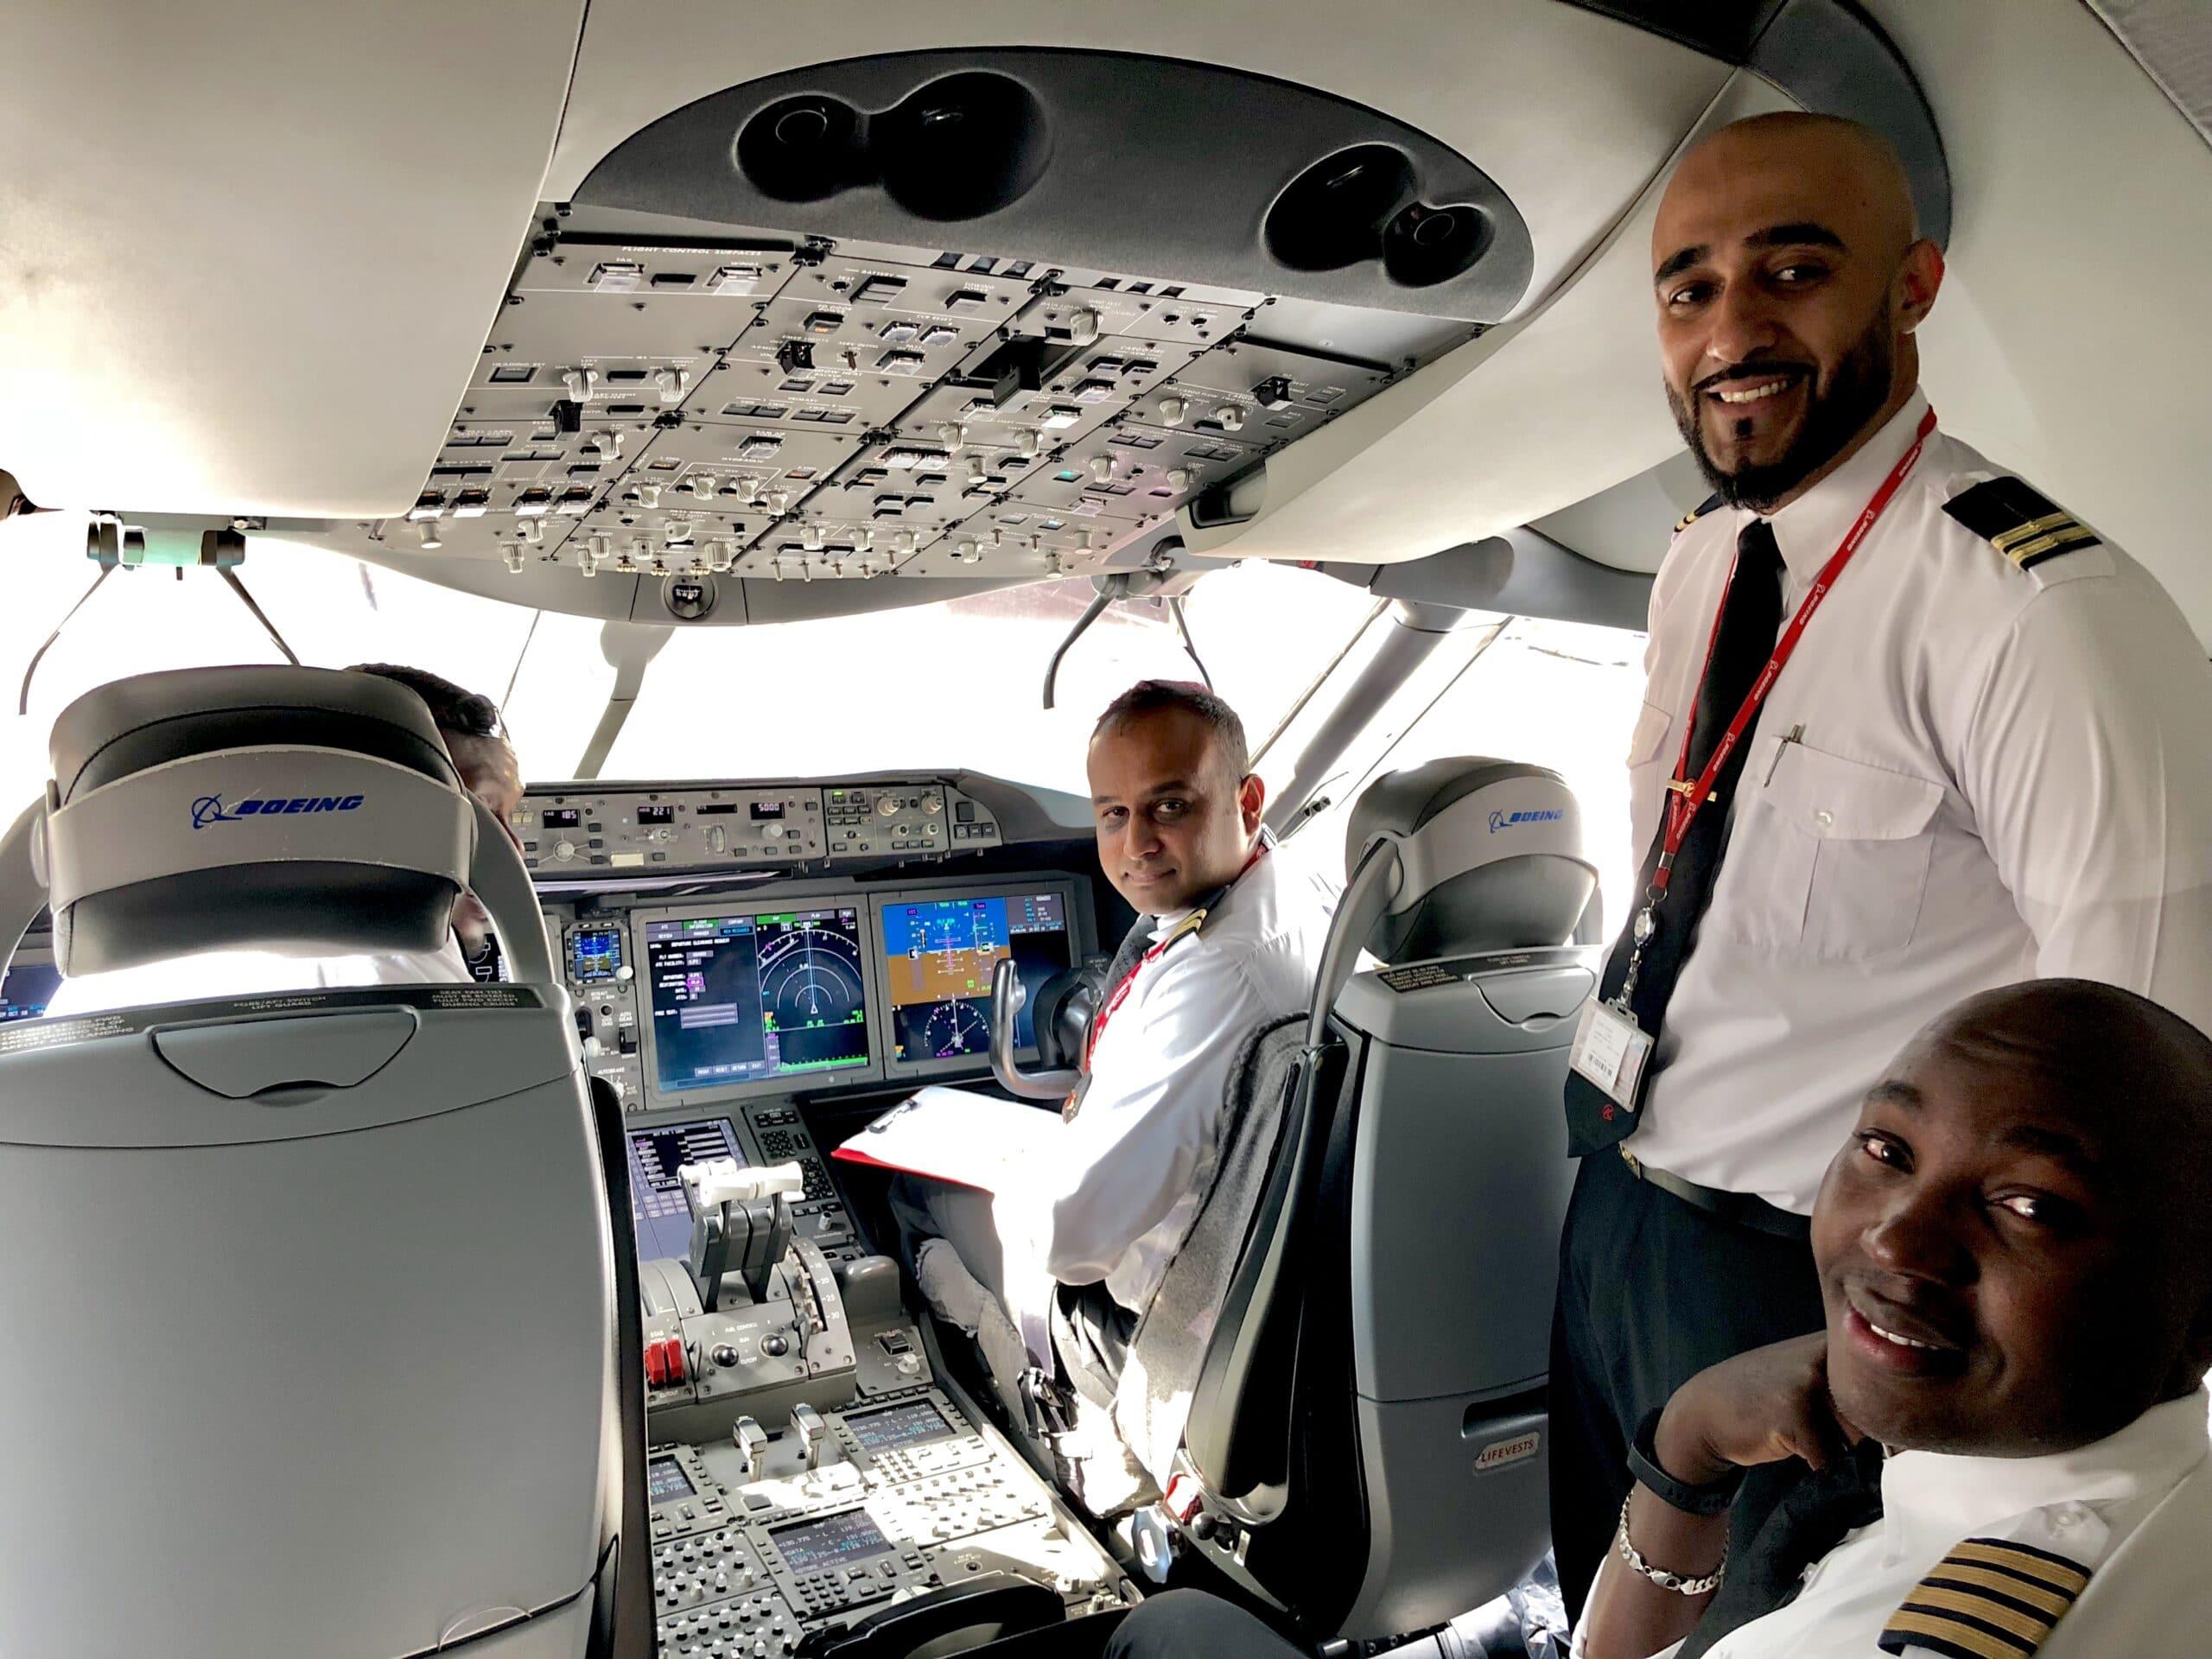 The pilots on the 787 Dreamliner - Kenya Airways from JFK to Nairobi